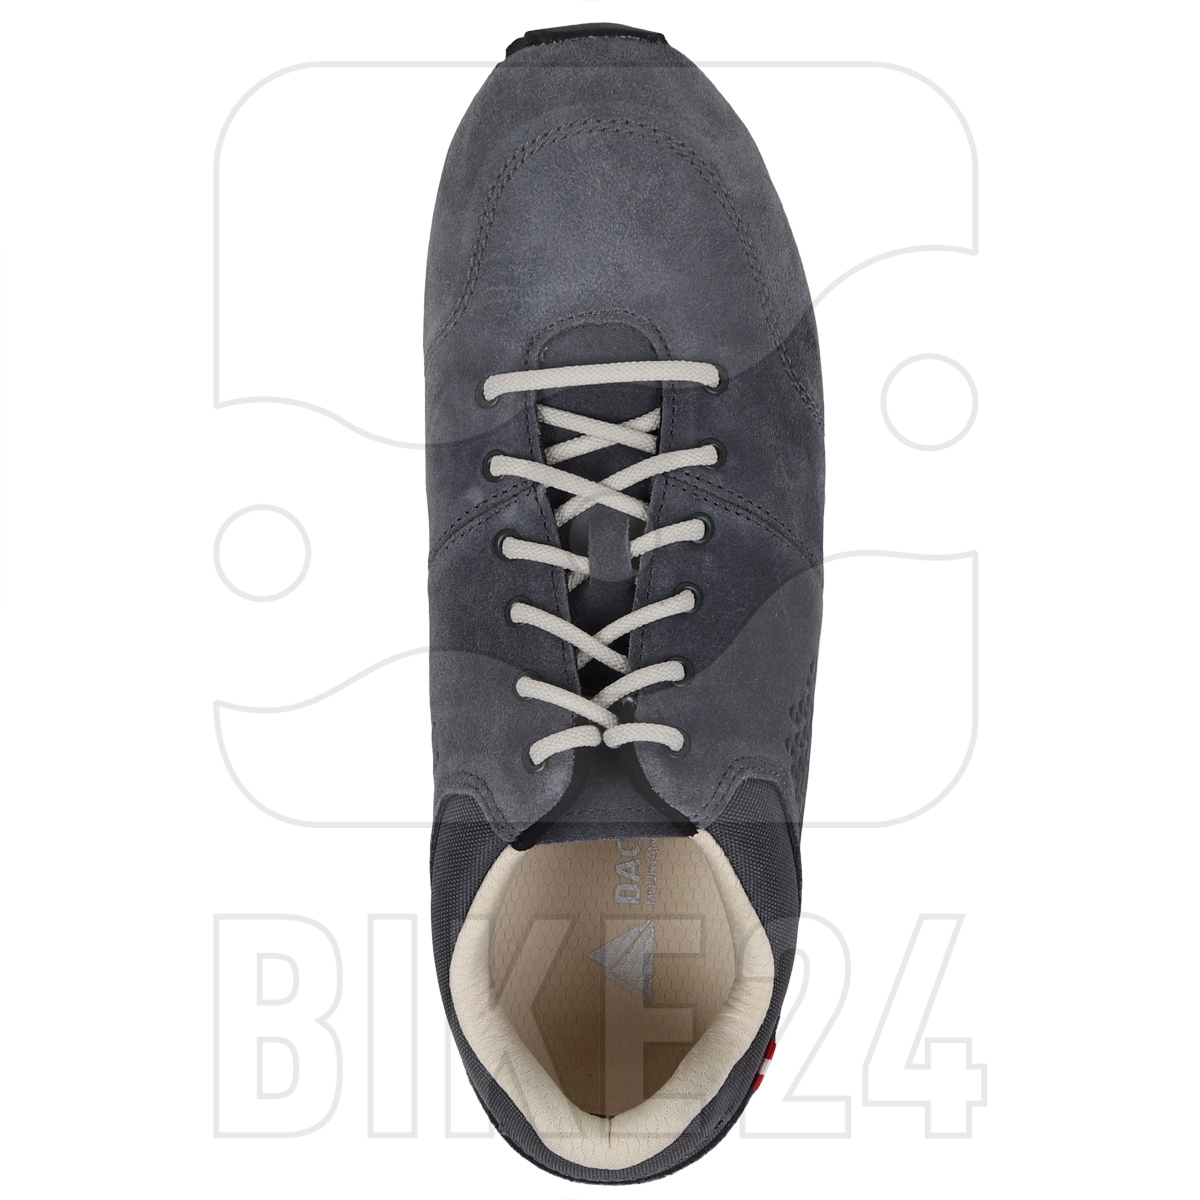 Image of Dachstein Skyline LC GTX Shoes - lead-grey